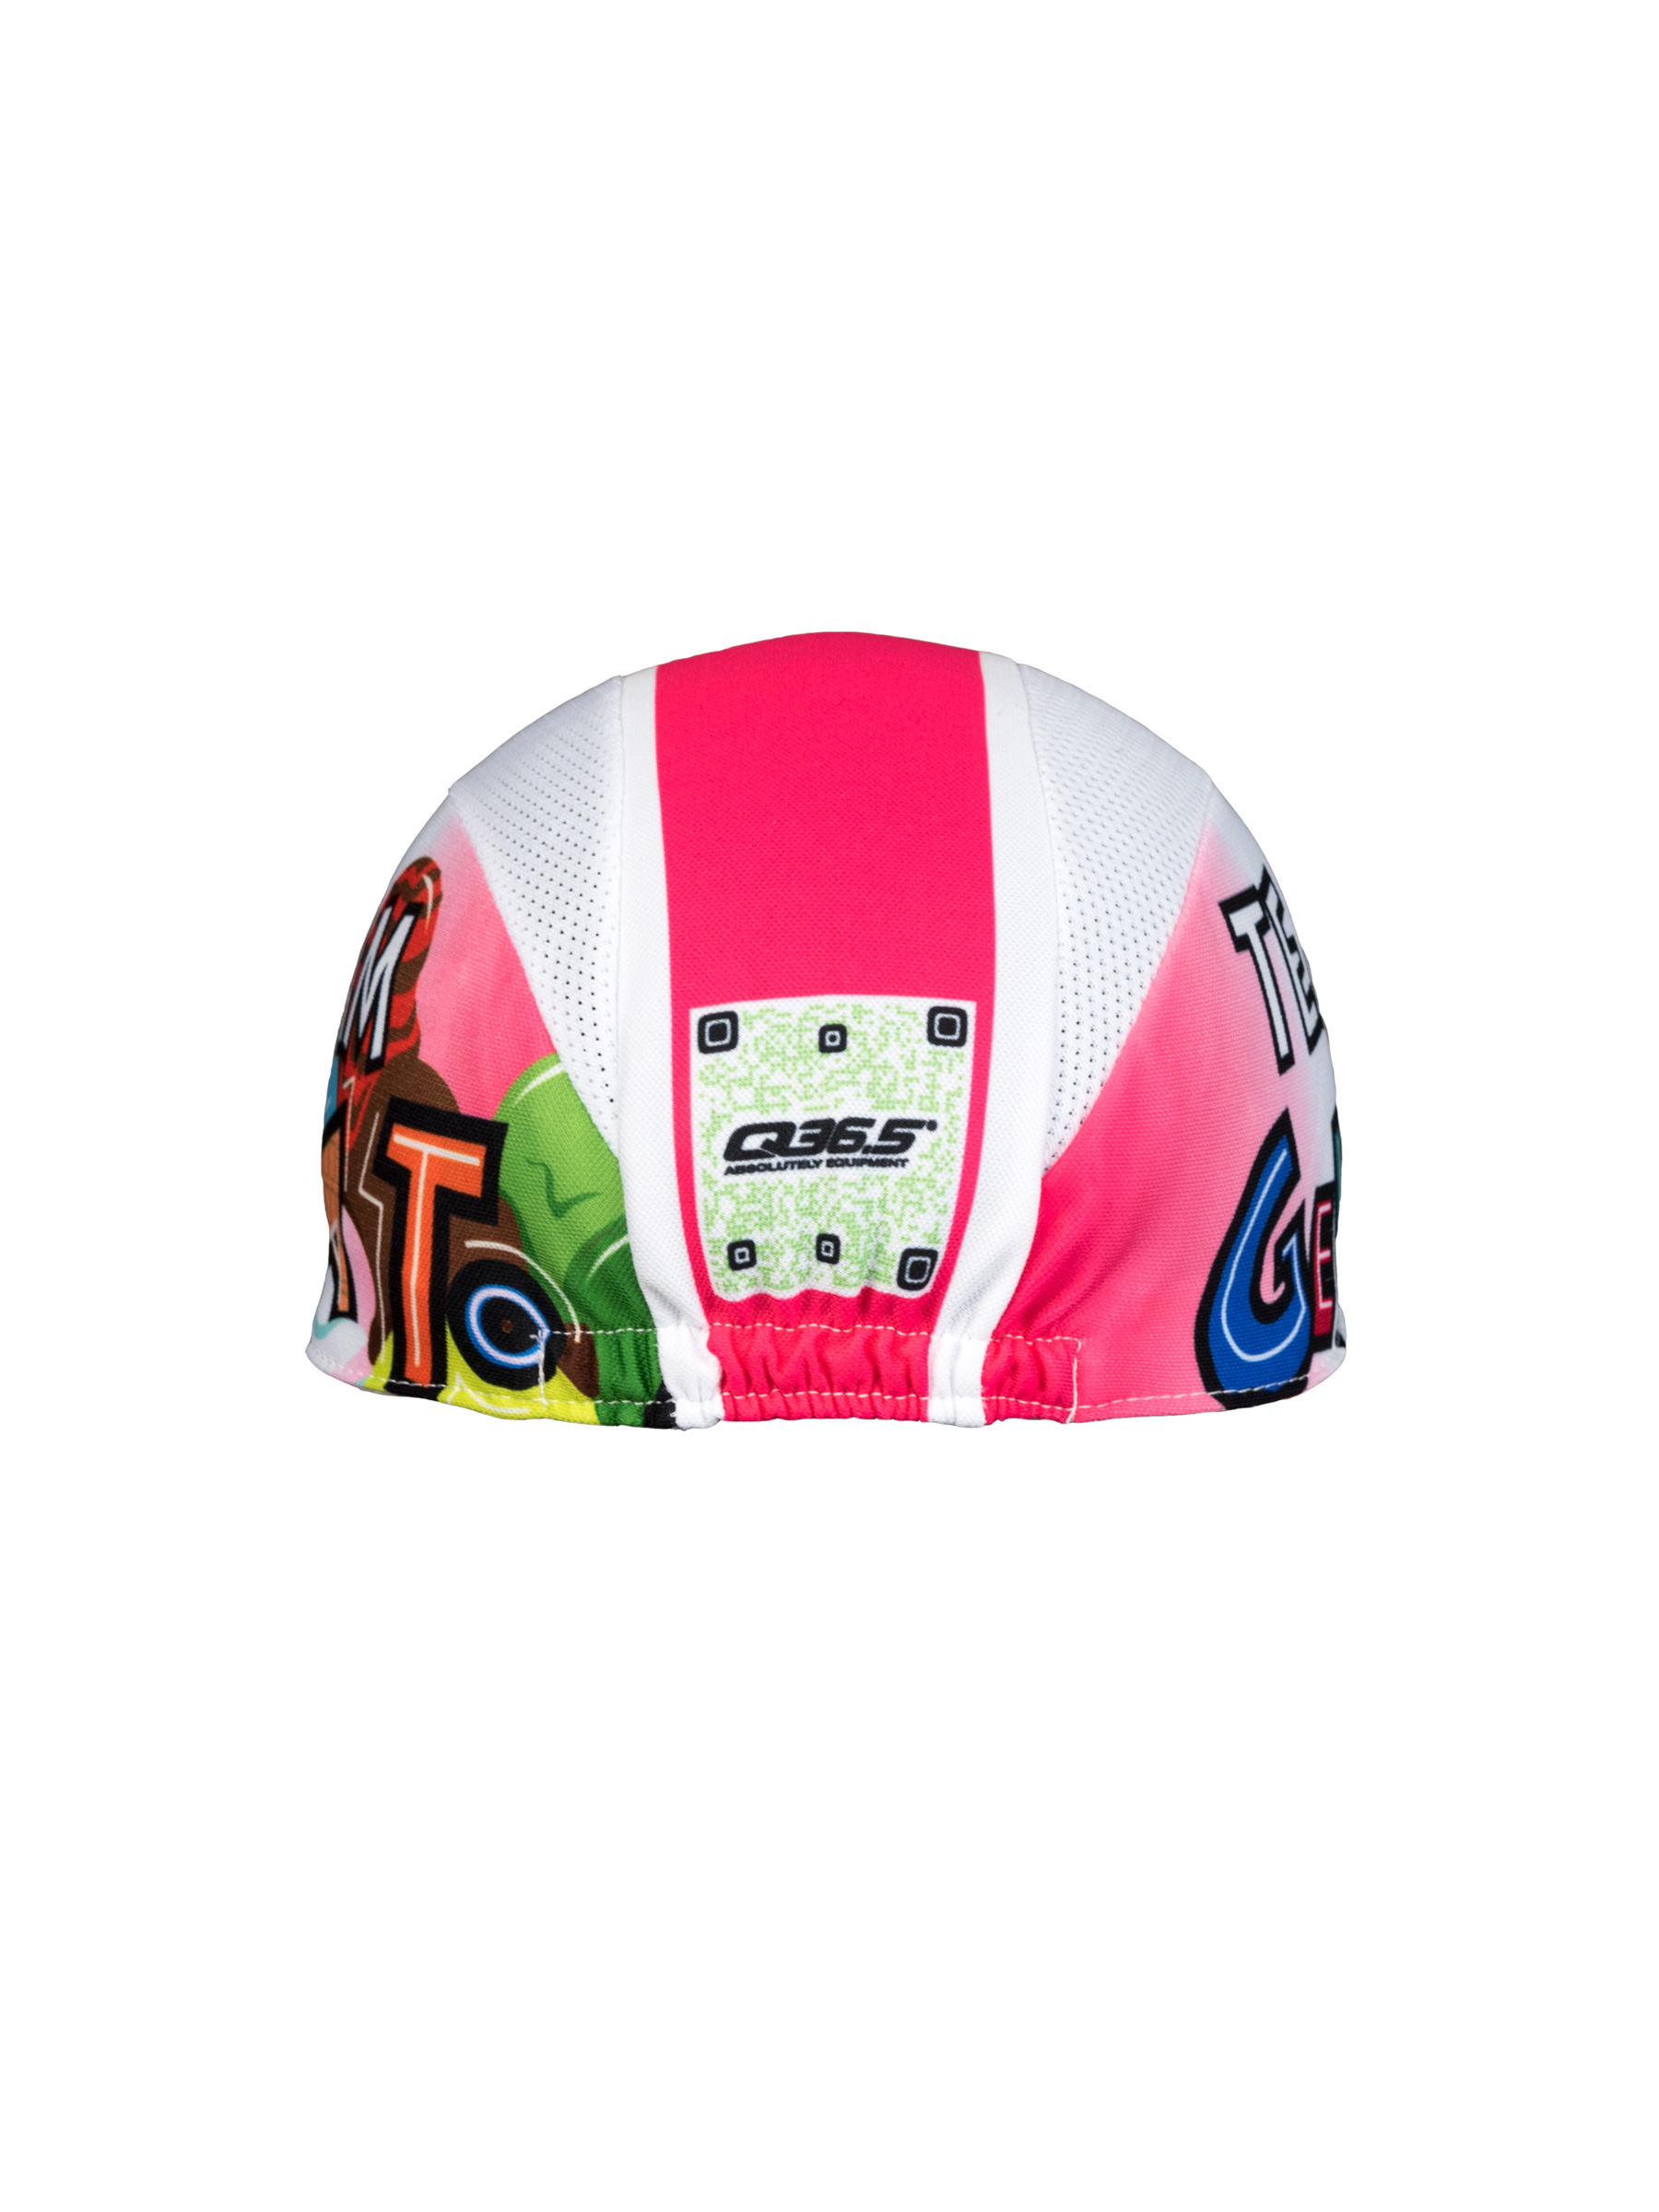 Gorra Summer Cap L1 Team Gelato